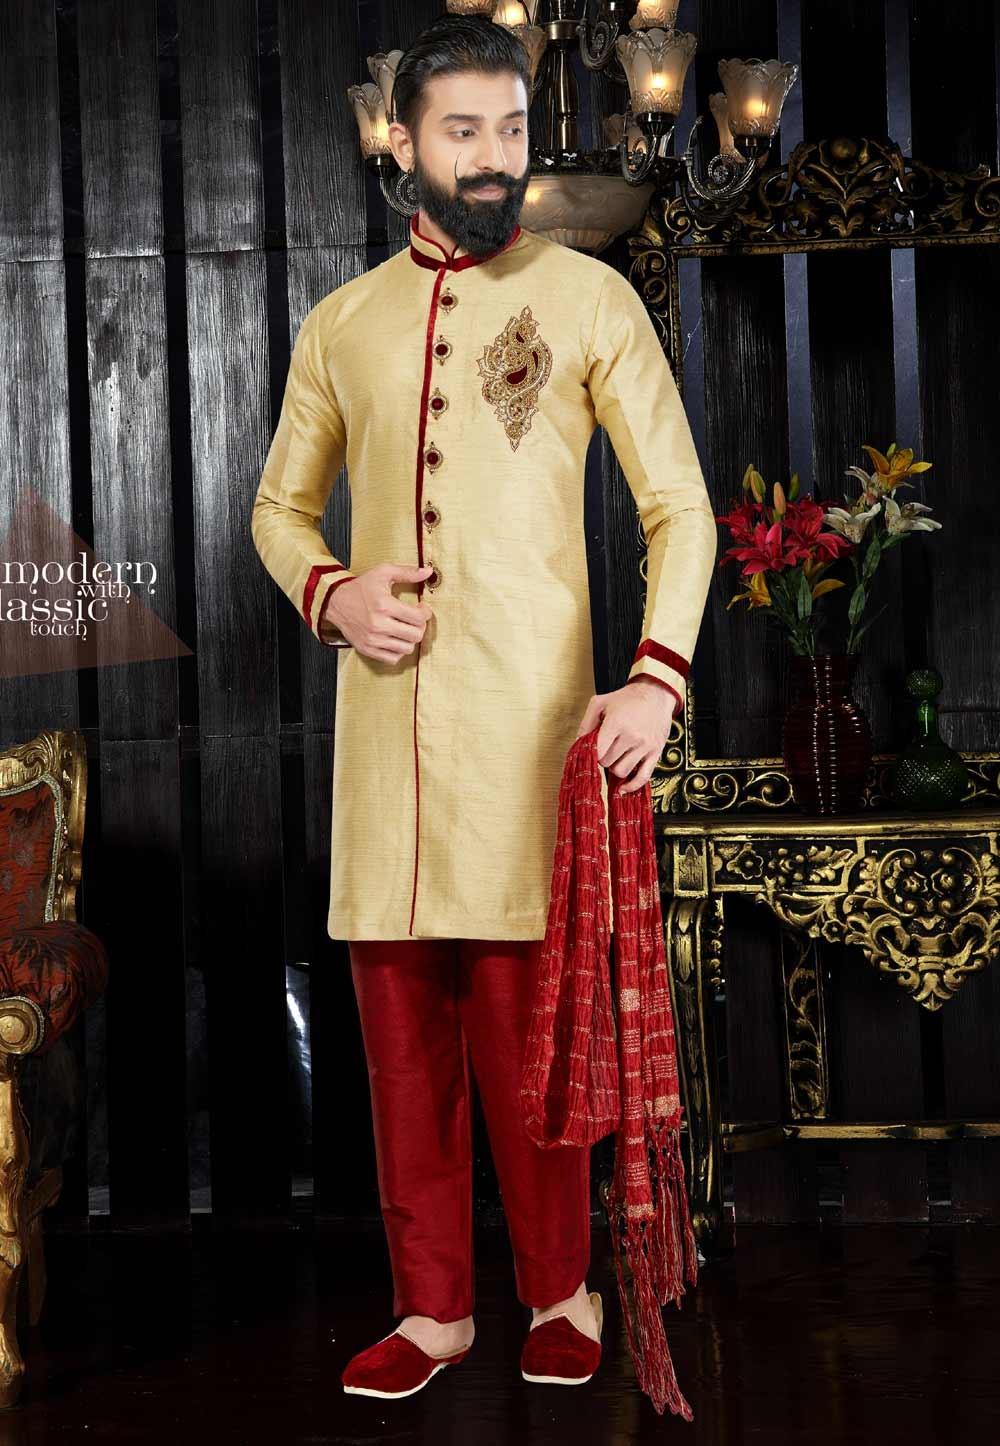 Exquisite Raglan Sleeves Gold Color Dupion Art Silk Readymade Kurta For Men's